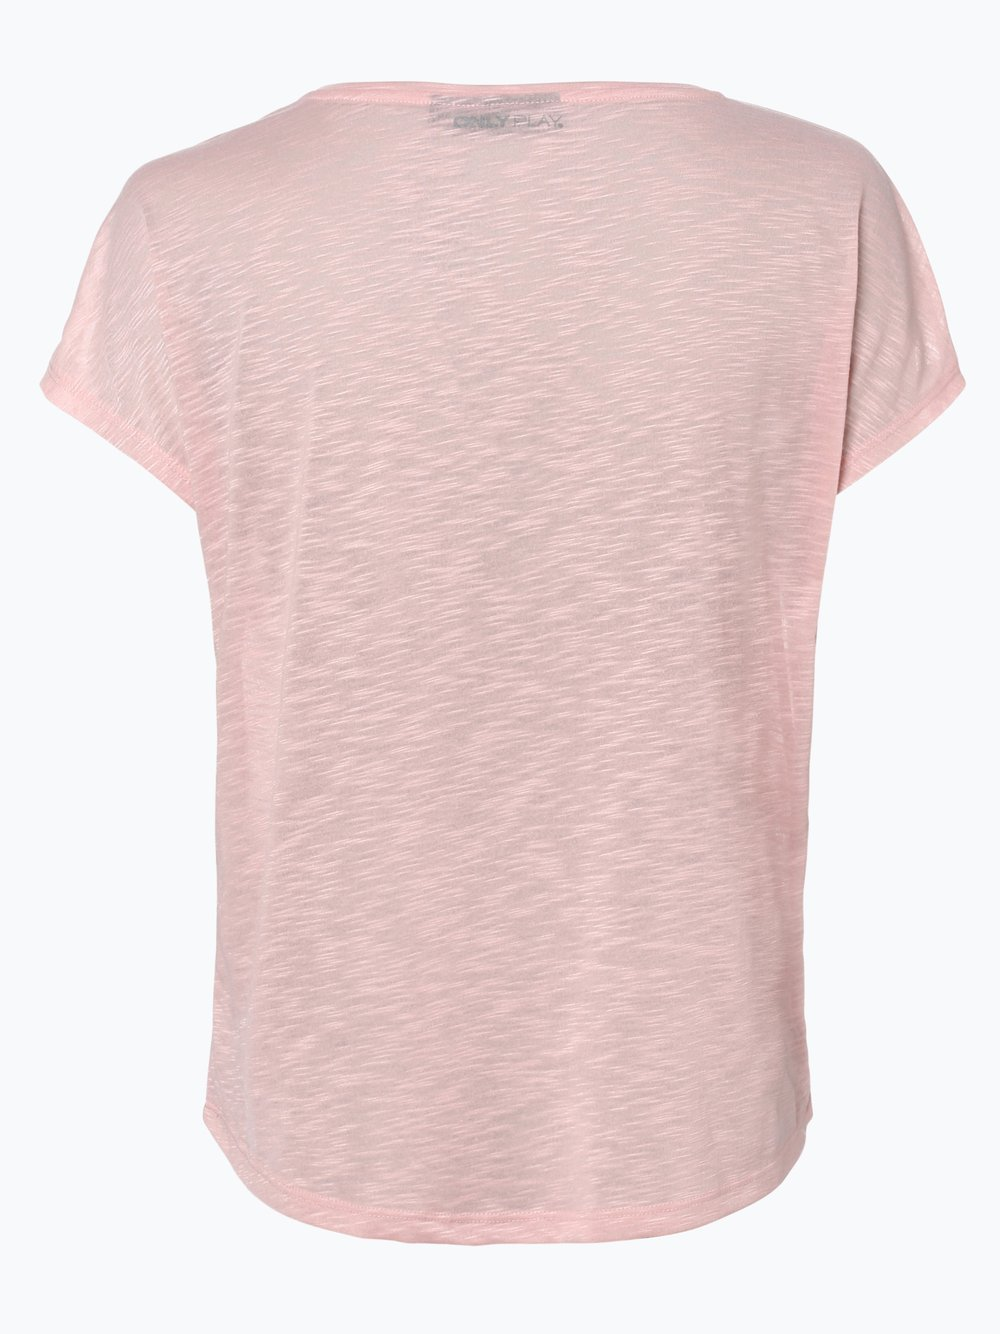 finest selection c6d2a fbee8 Damen Sportswear T-Shirt